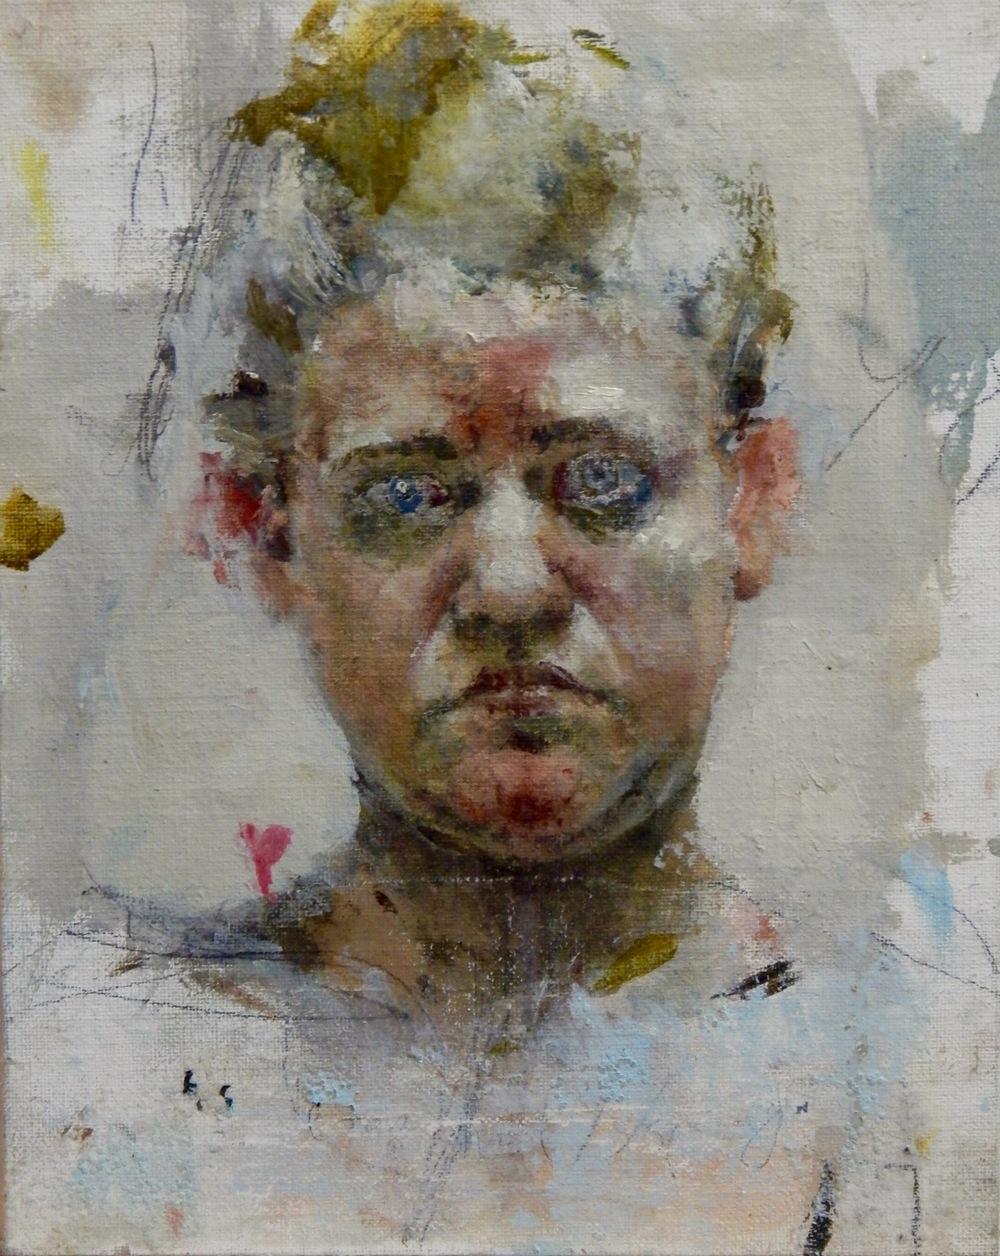 Self-Portrait Study